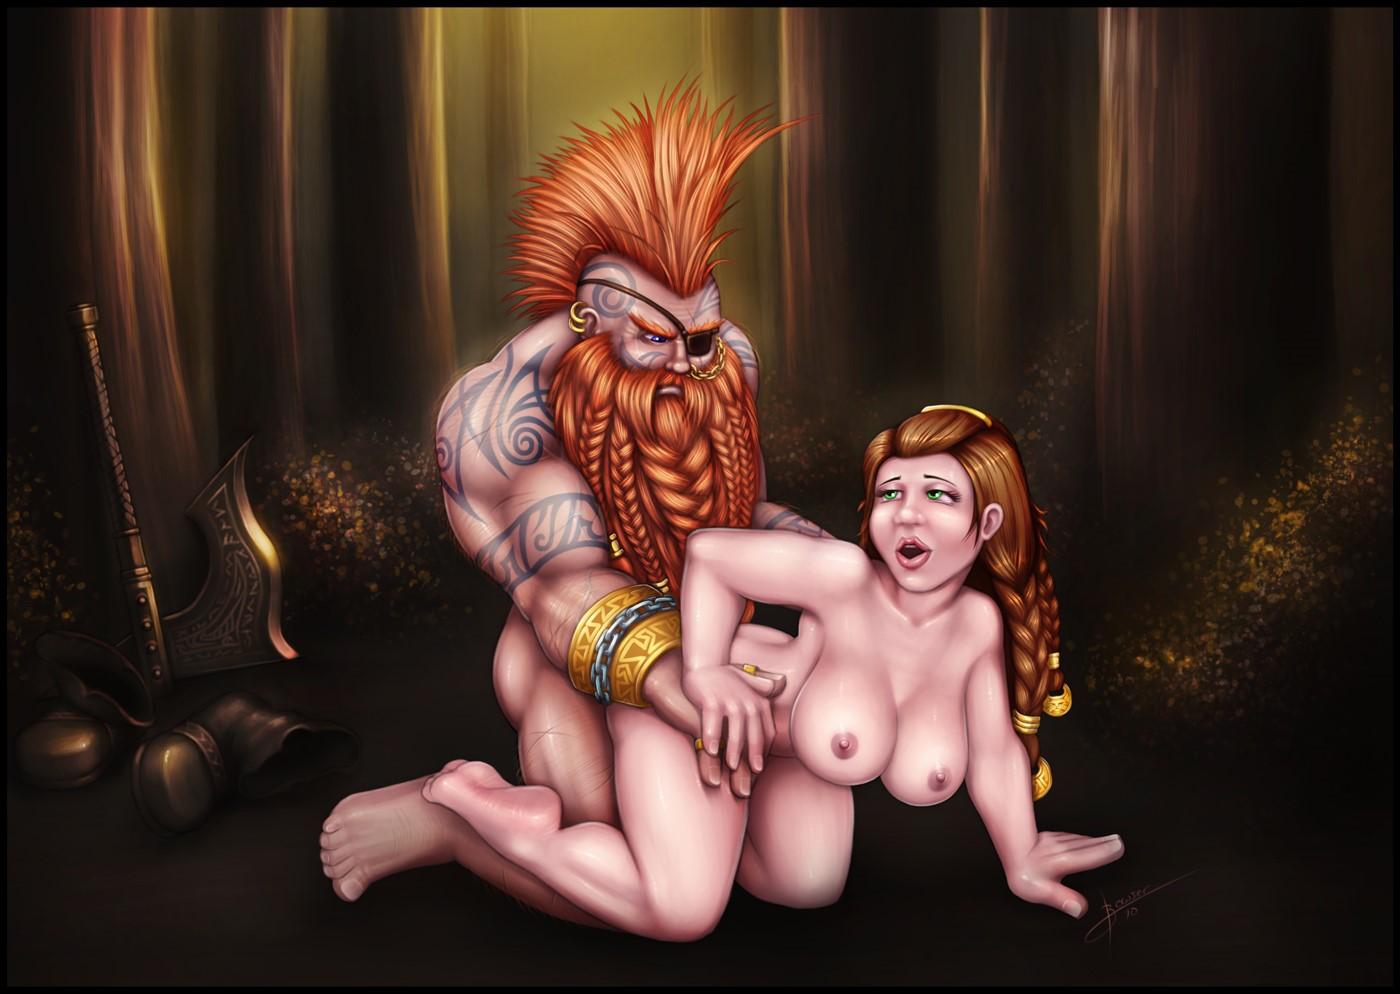 Dwarf lady having sex nackt women